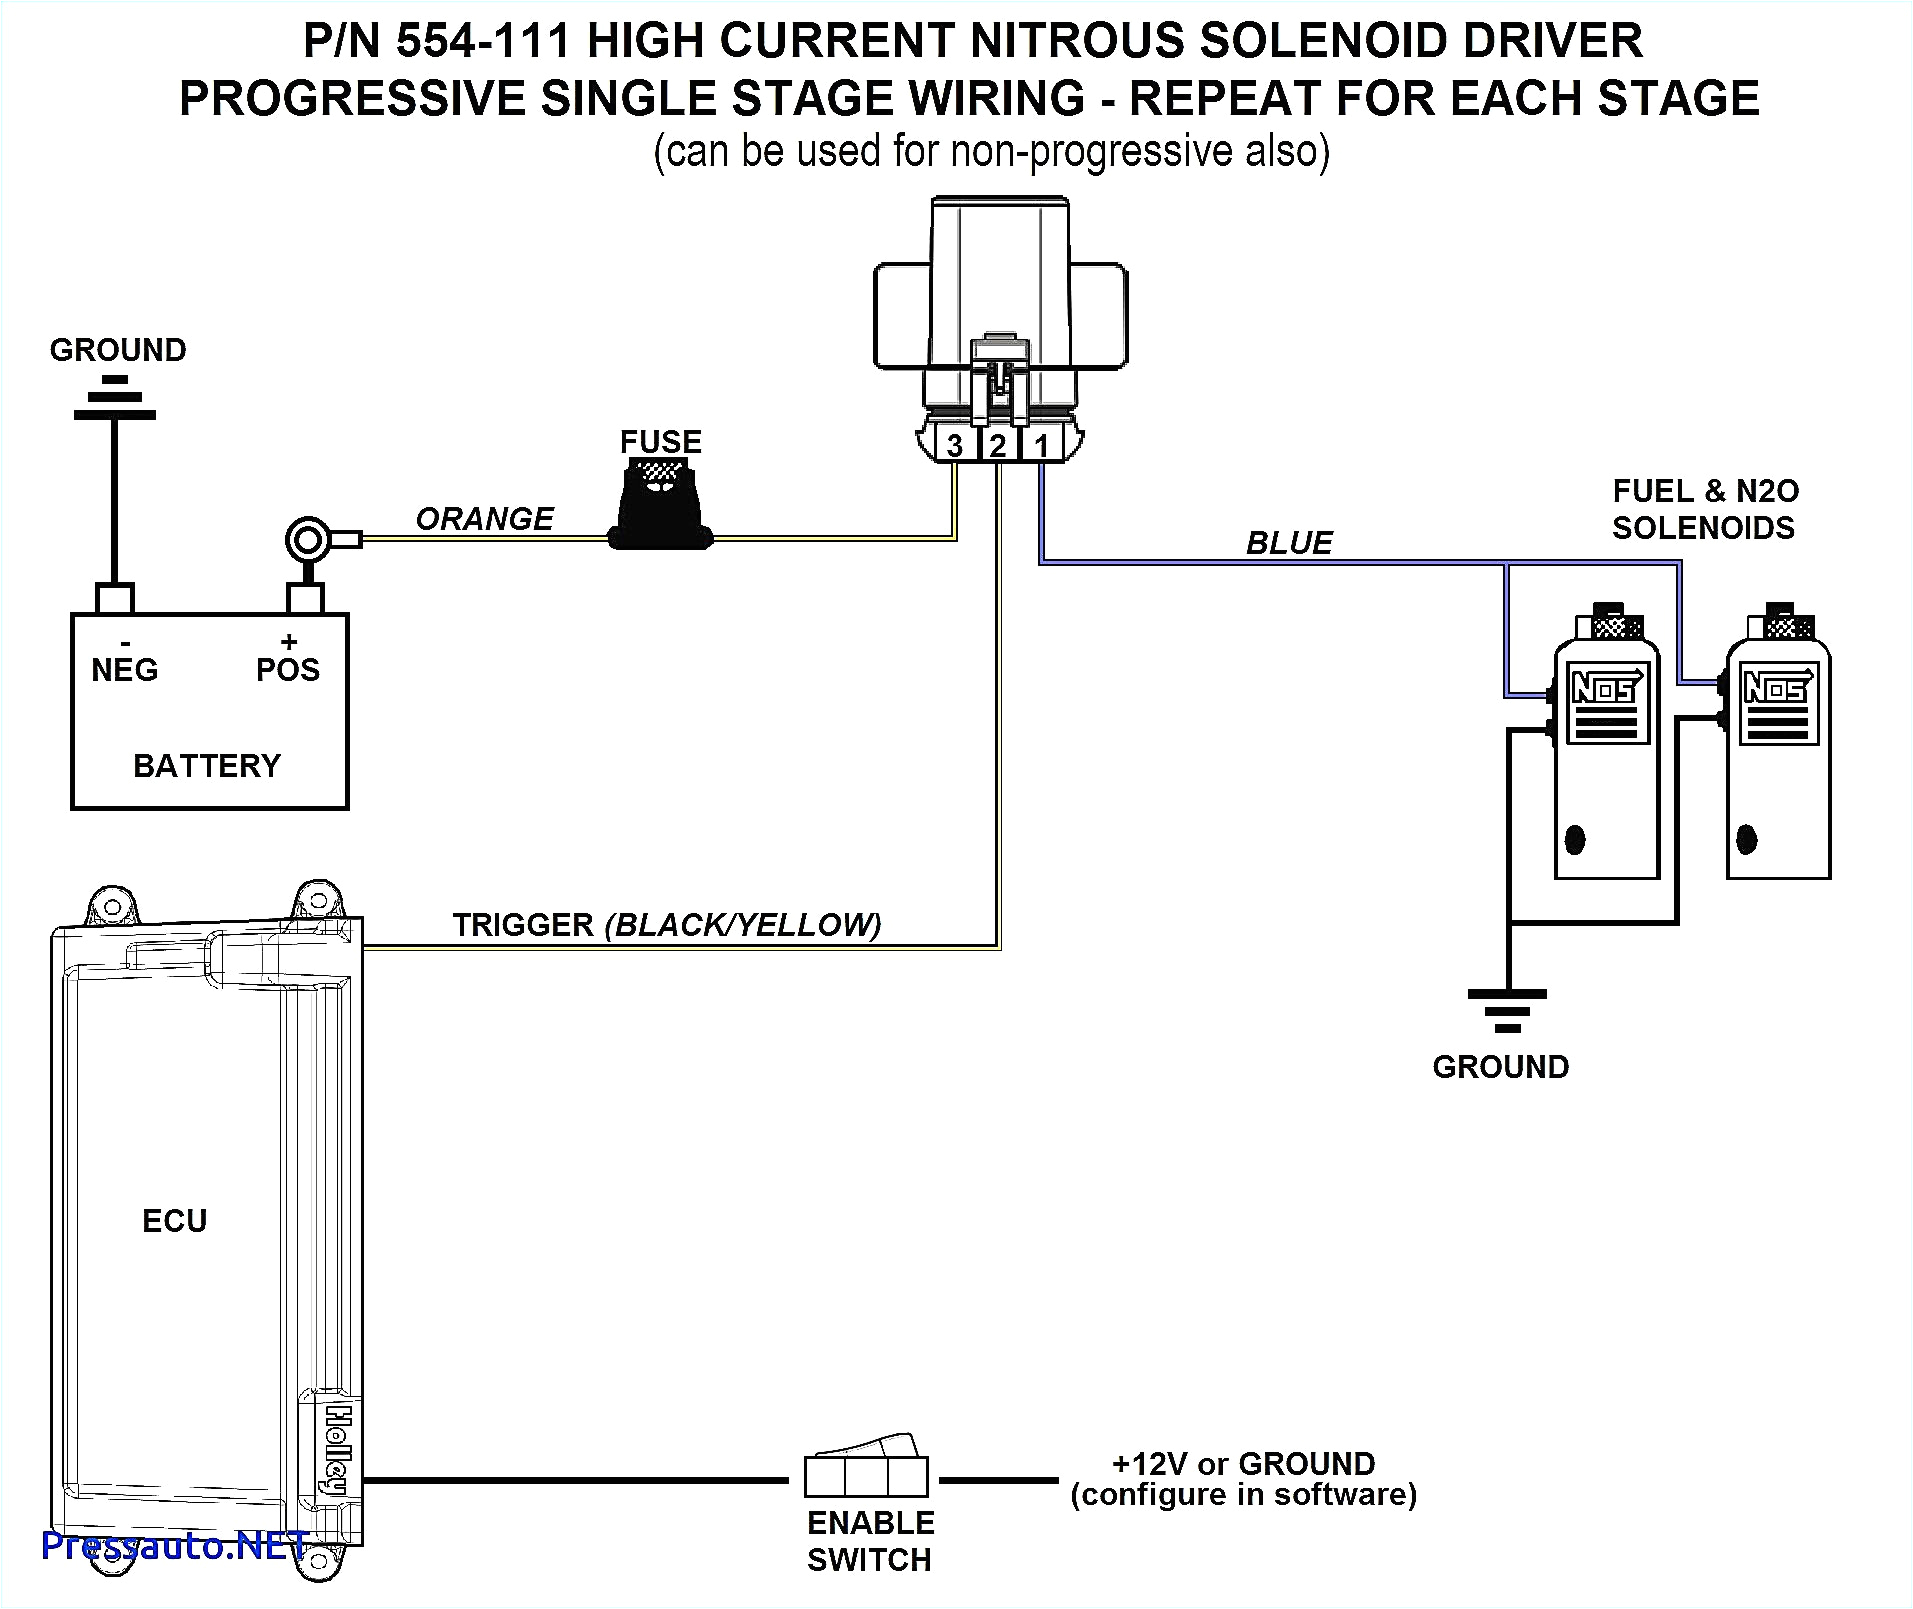 2005 impala fuel pump wiring diagram wiring diagram inside 2003 impala fuel pump wiring diagram